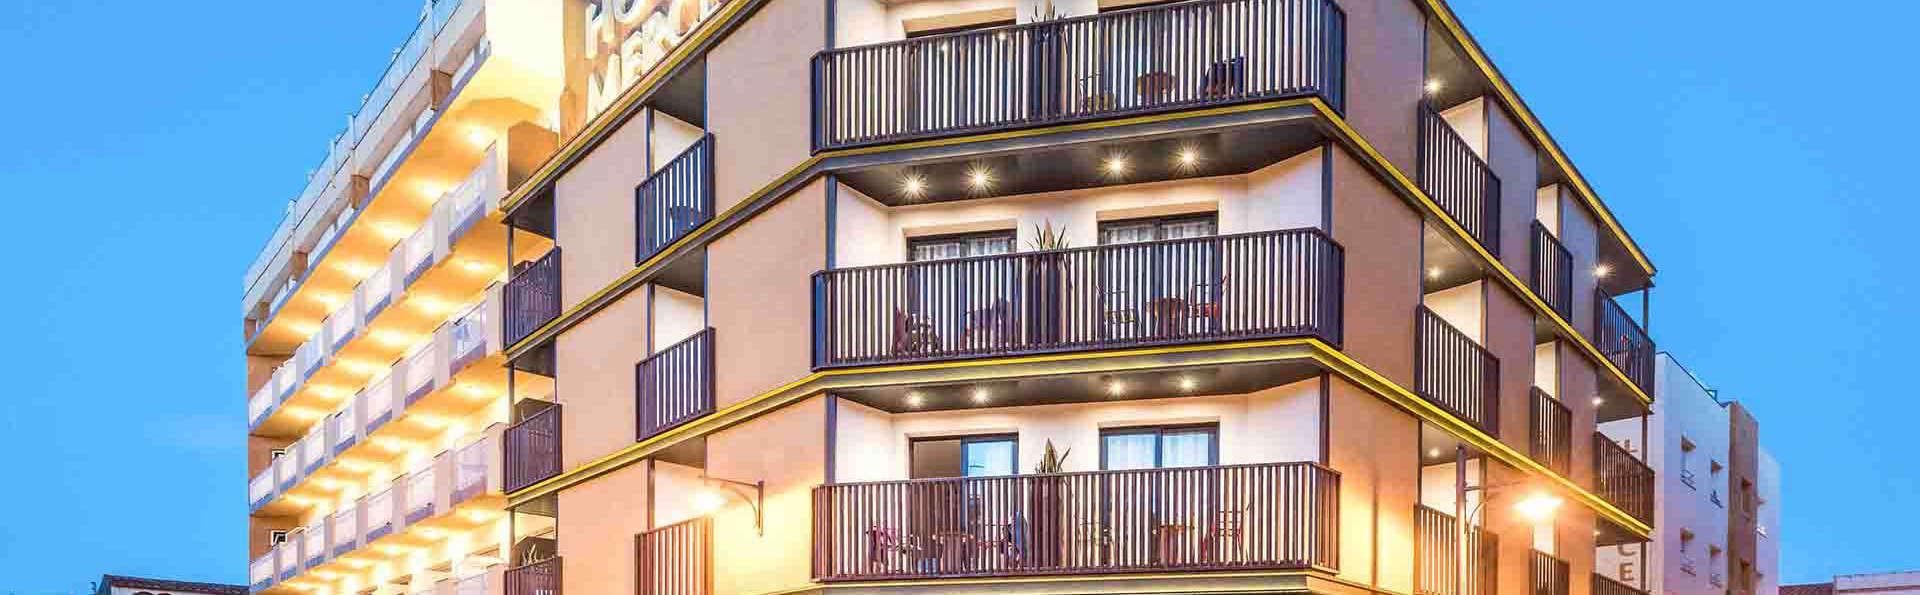 Hotel Mercè - EDIT_HOTEL_FACADE_01.jpg